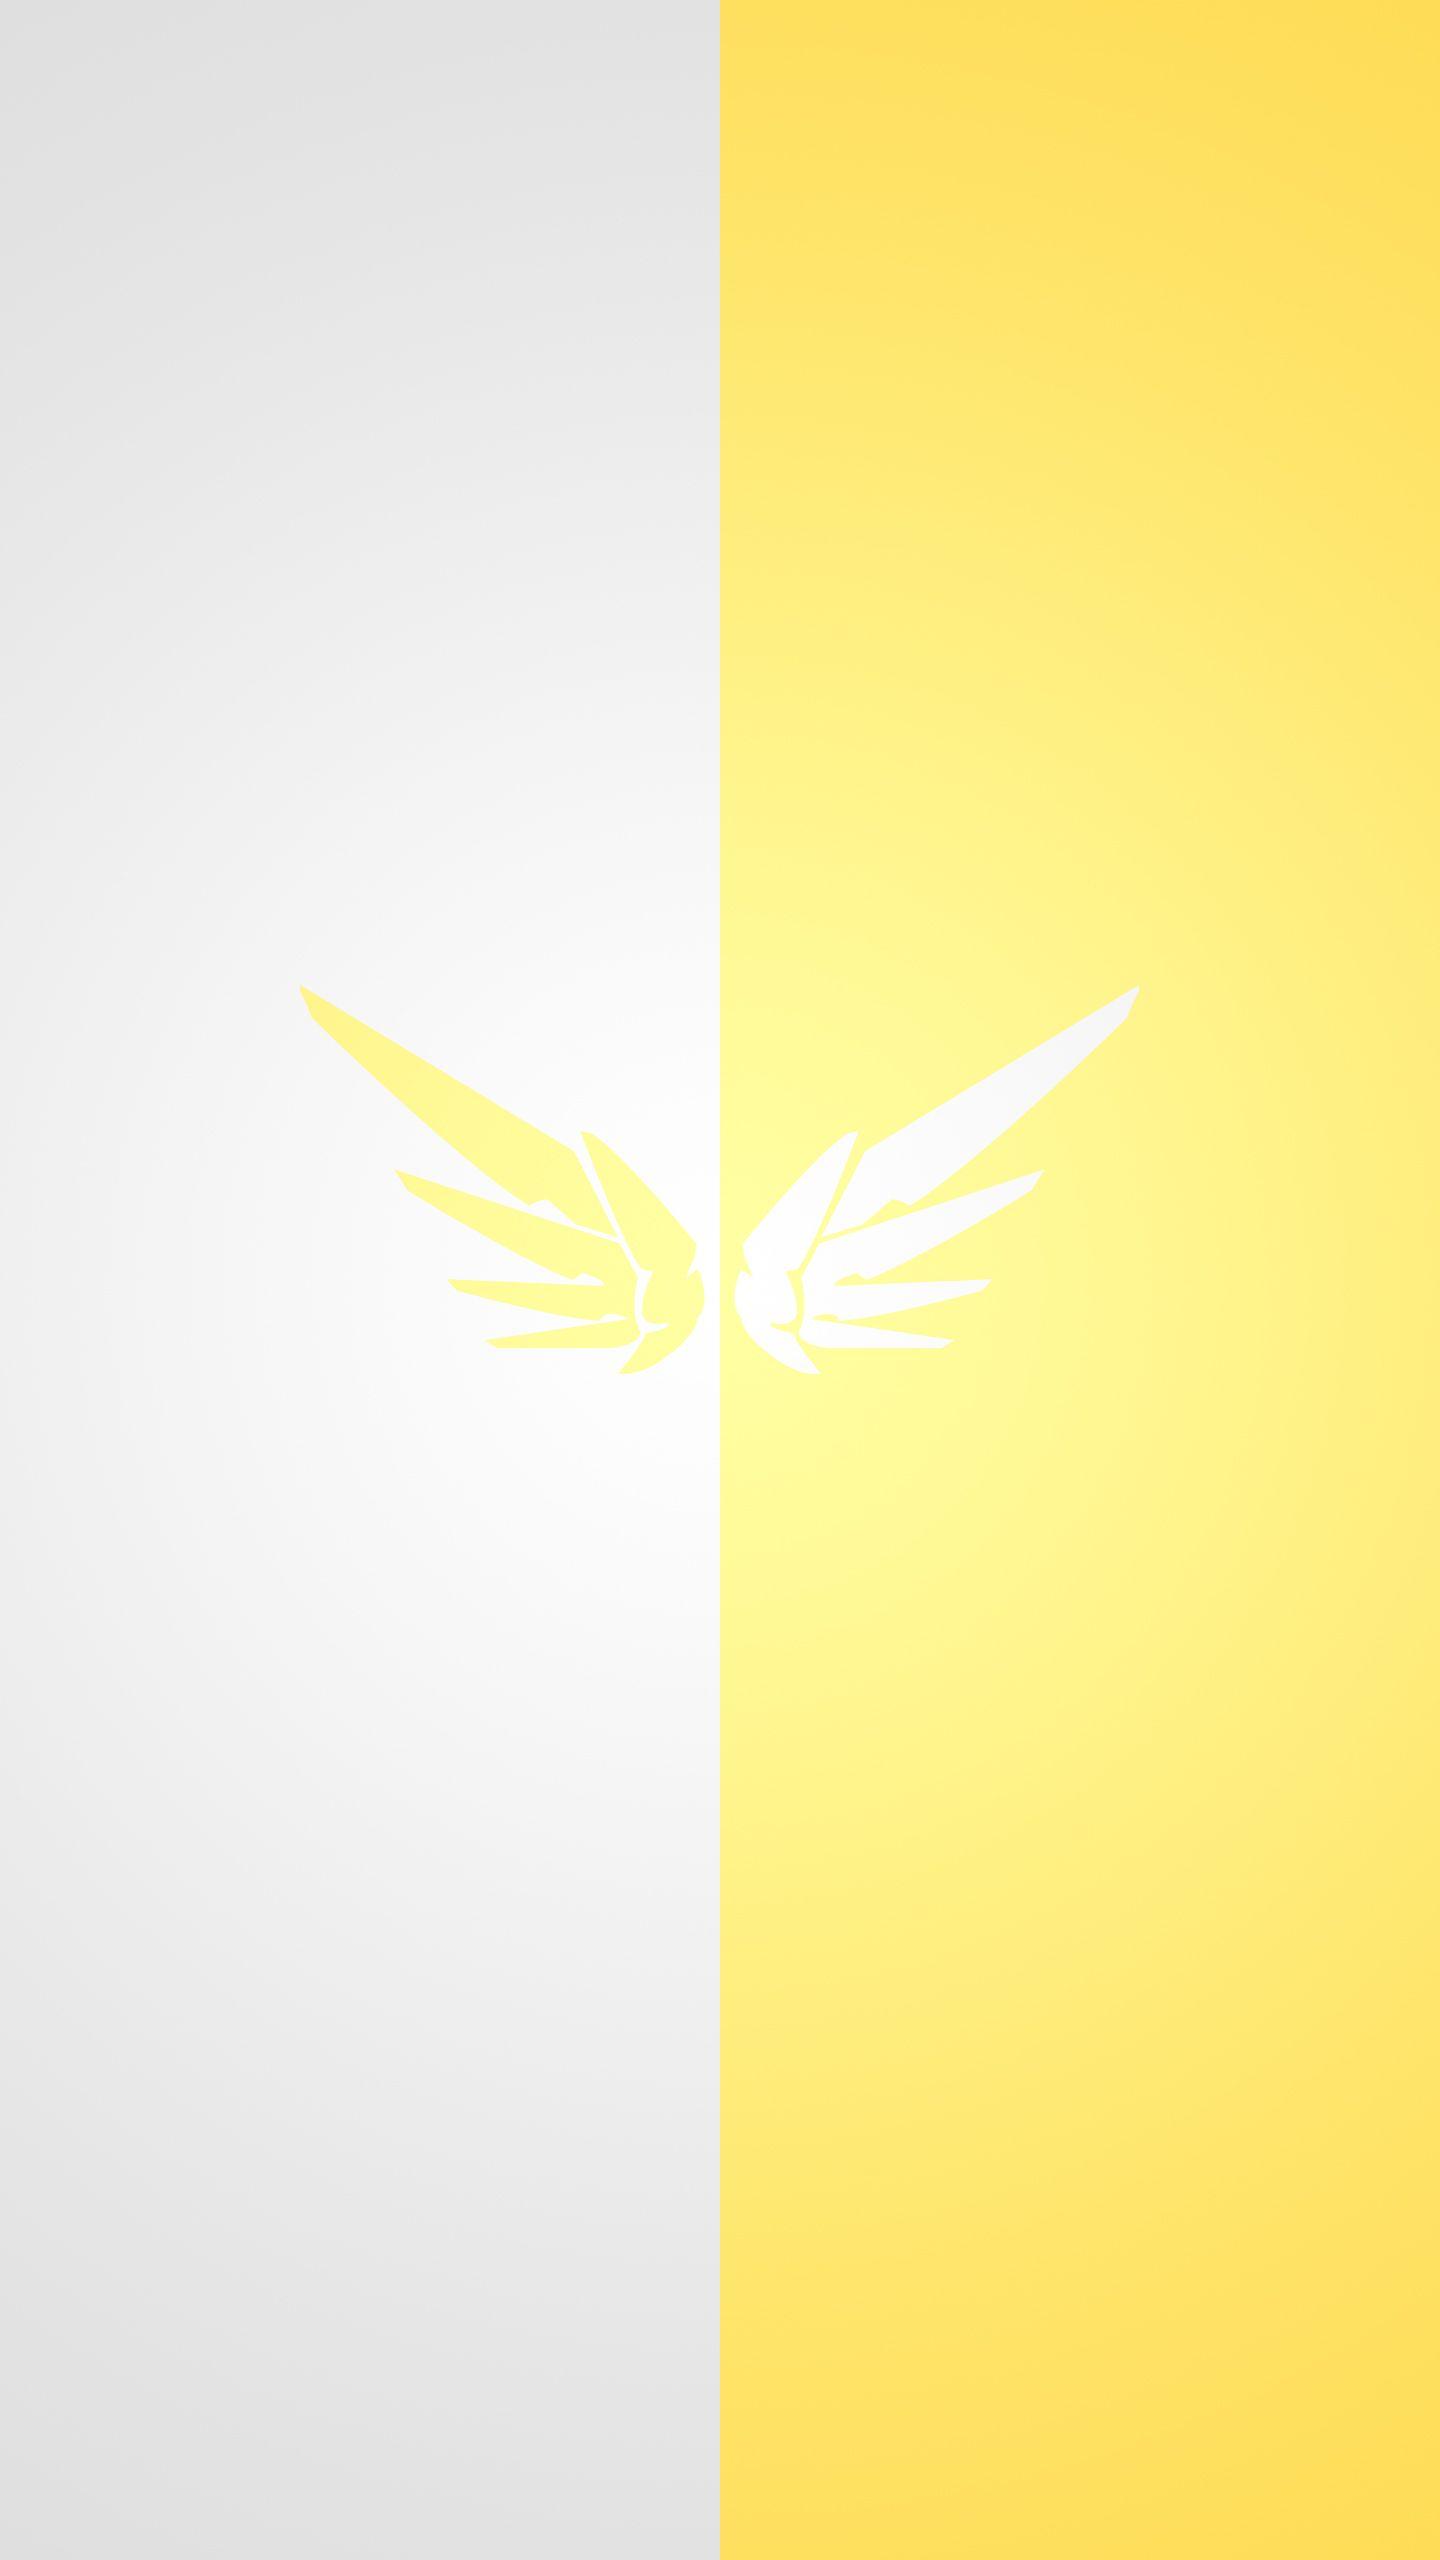 Overwatch Mercy Wallpaper For V20 Mercy Pinterest